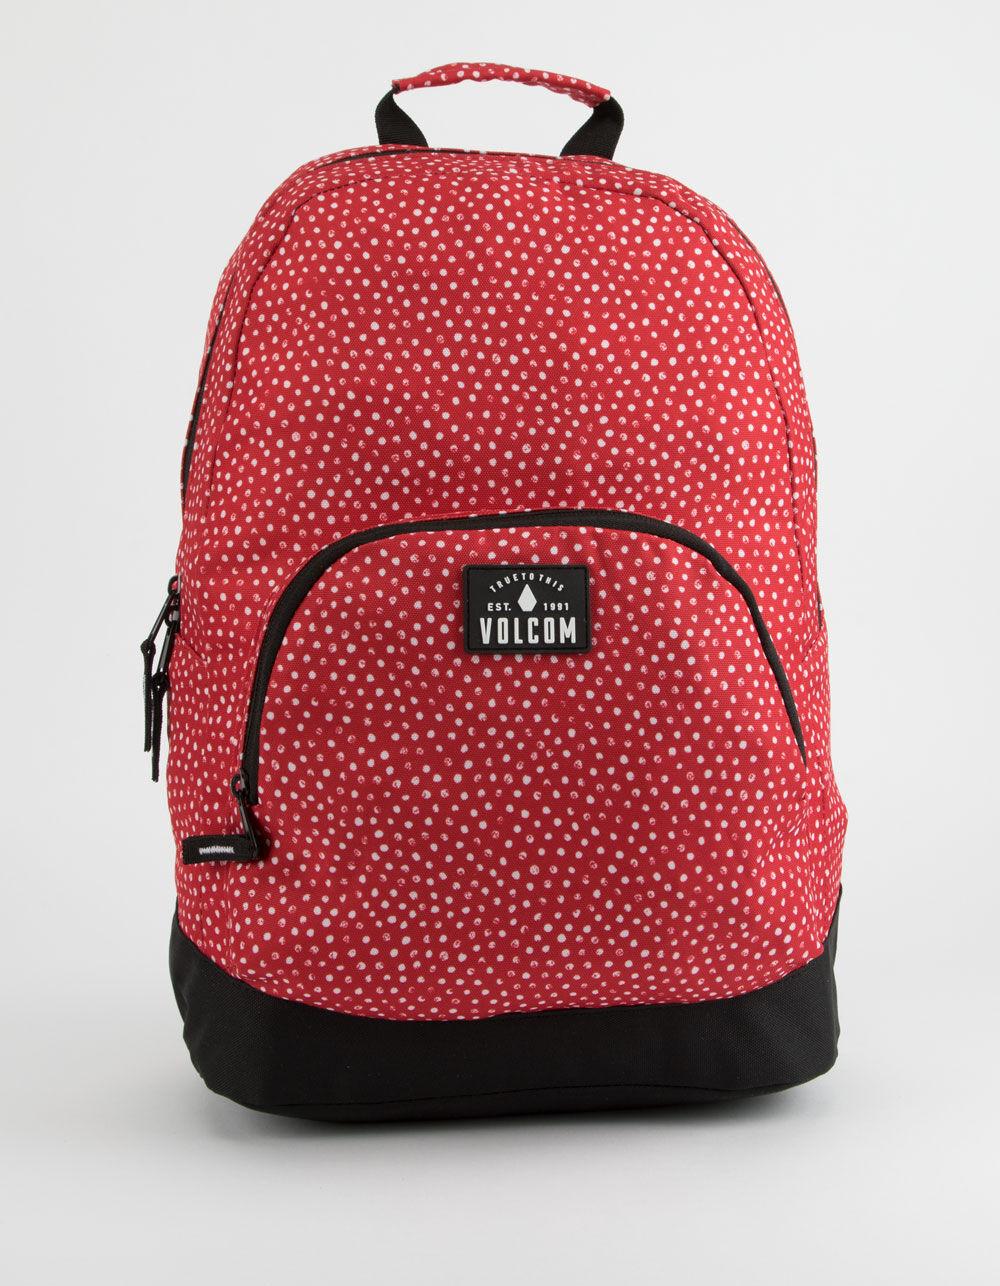 VOLCOM Schoolyard Poly Backpack